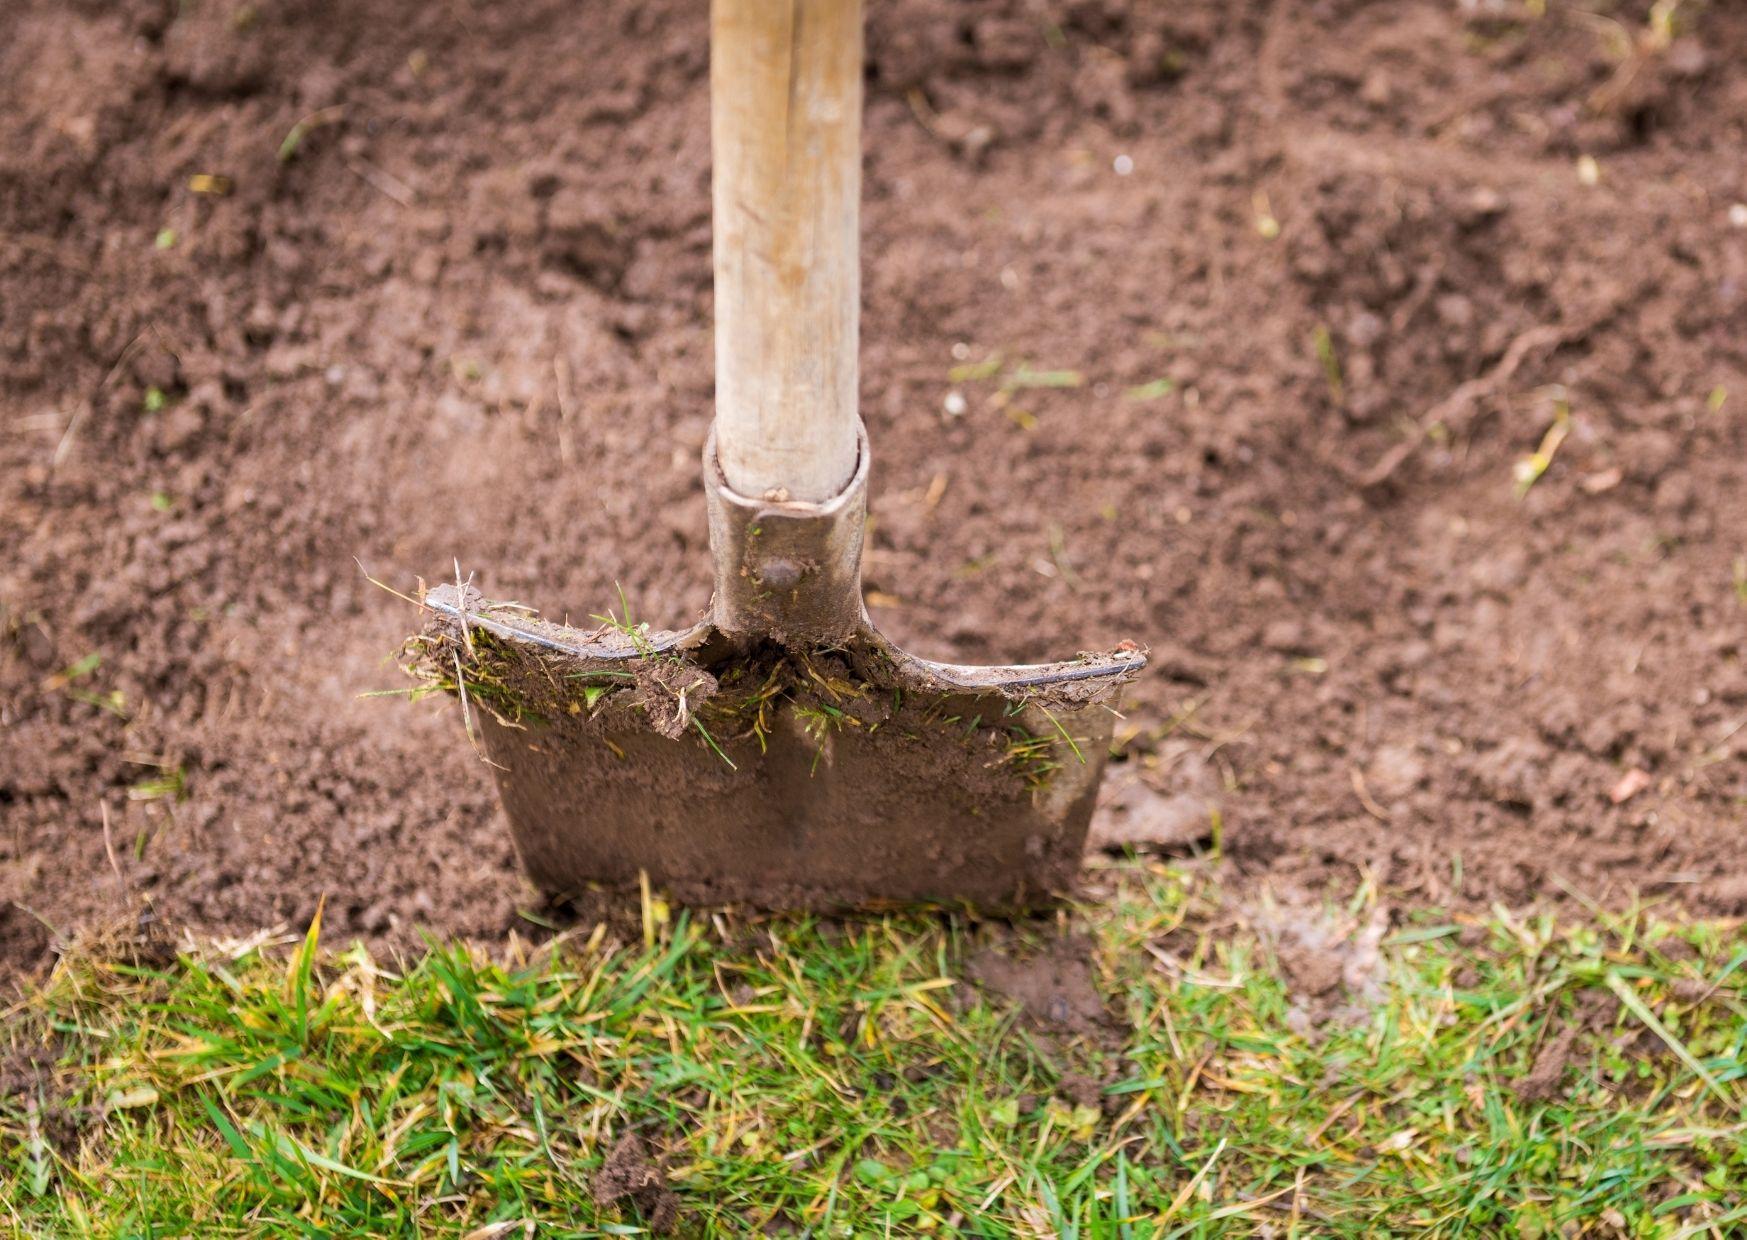 digging grass